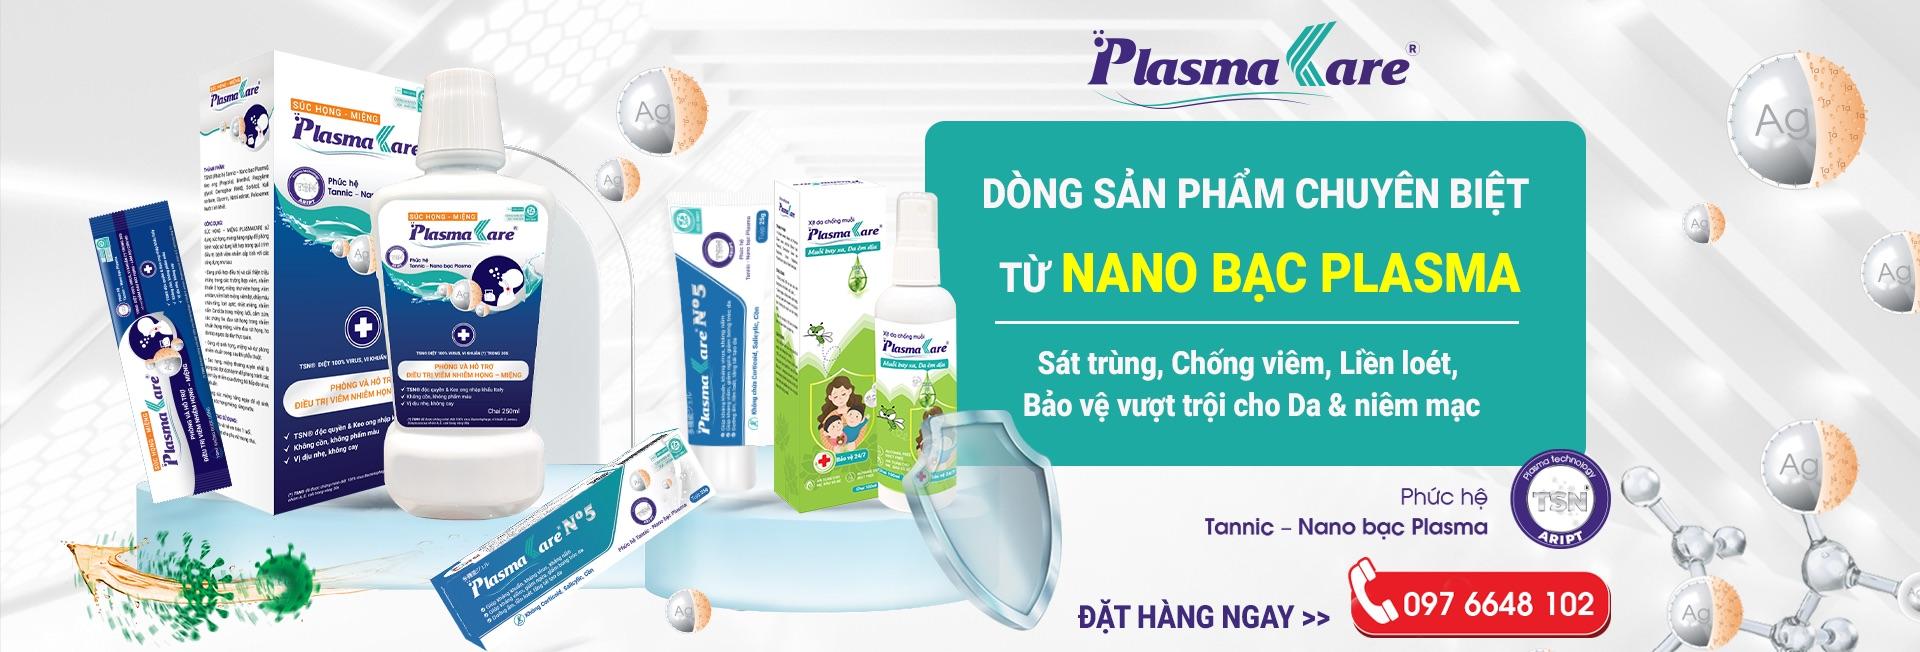 Dong-san-pham-khang-khuan-tu-nano-bac-plasmakare-2